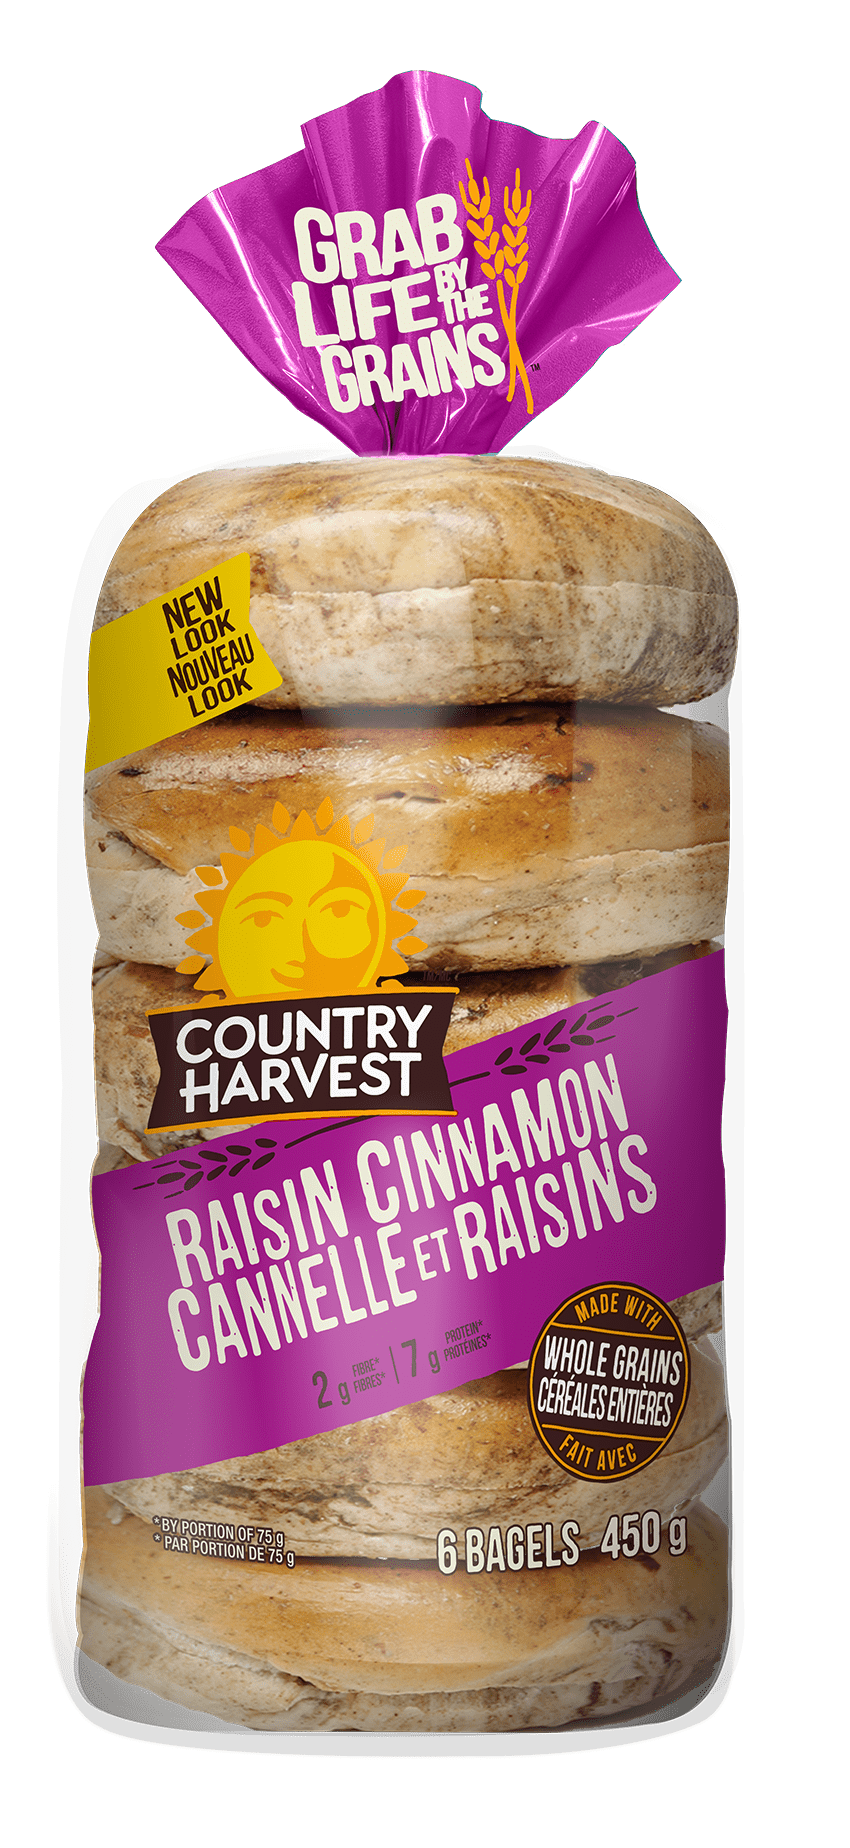 Country Harvest Cinnamon Raisin Bagels